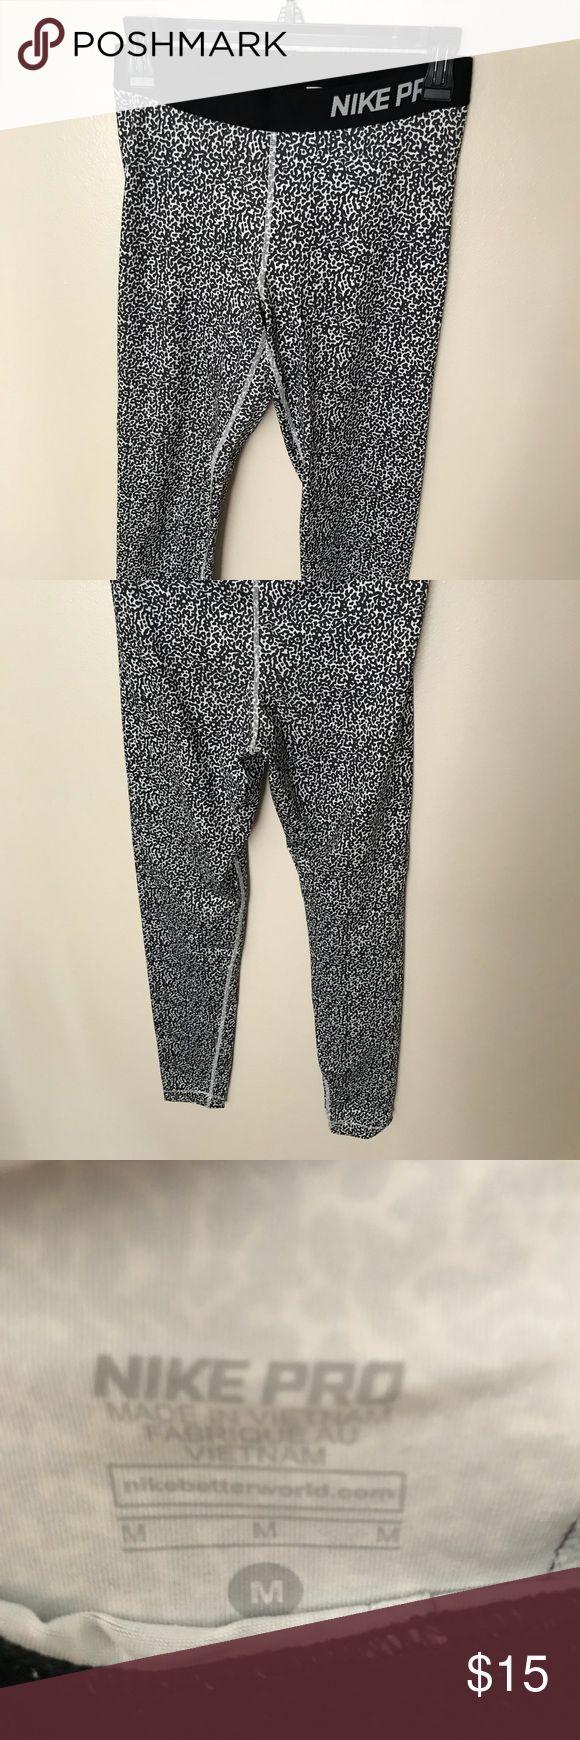 Nike pro workout pants Black and white Nike pro pants Nike Pants